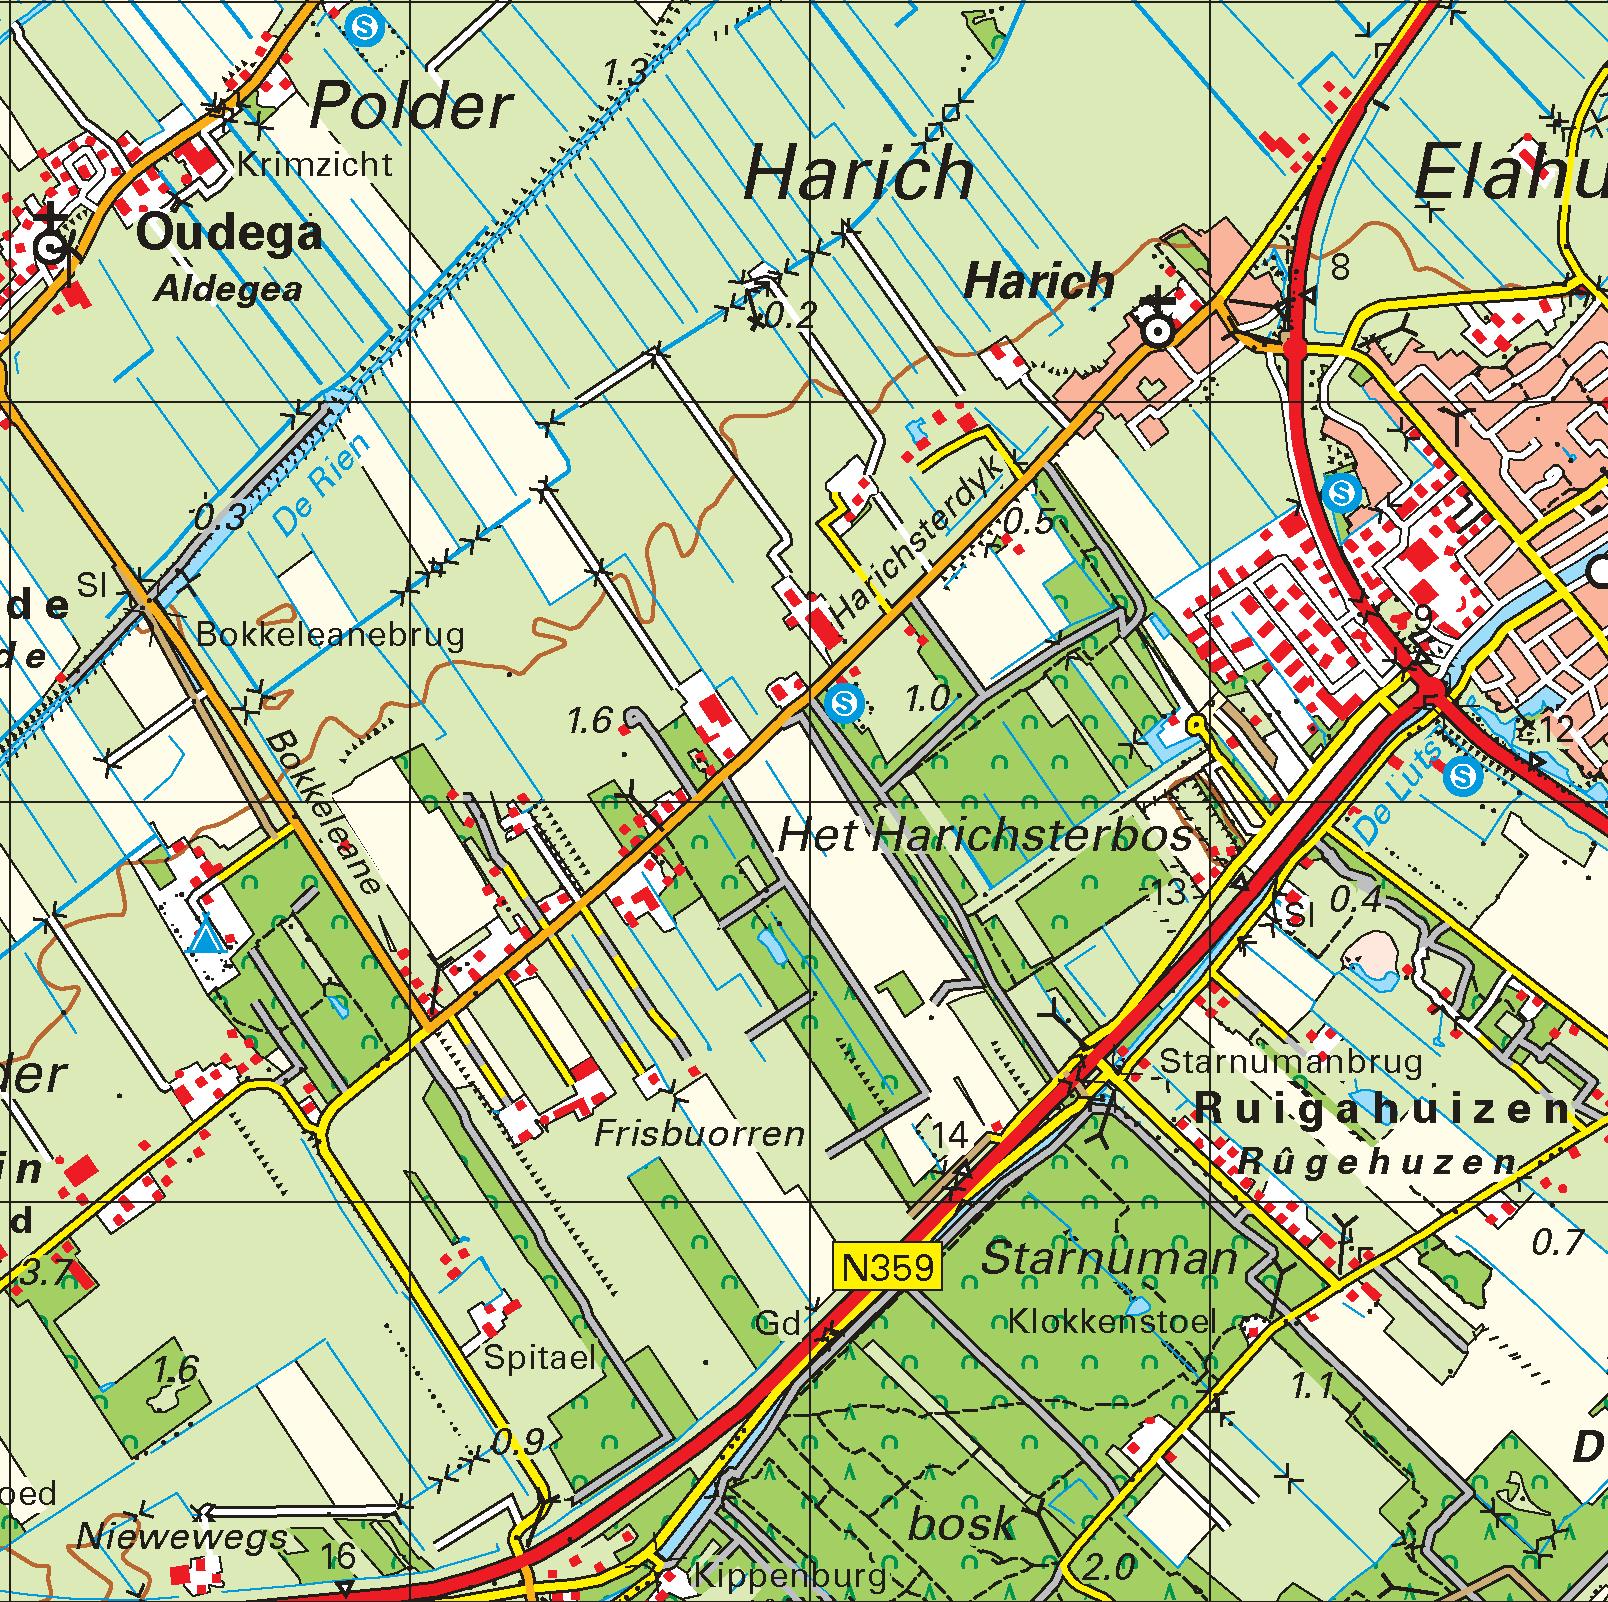 Topografische kaart schaal 1:50.000 (Enkhuizen ,Lemmer, Emmeloord, Lelystad, Dronten)